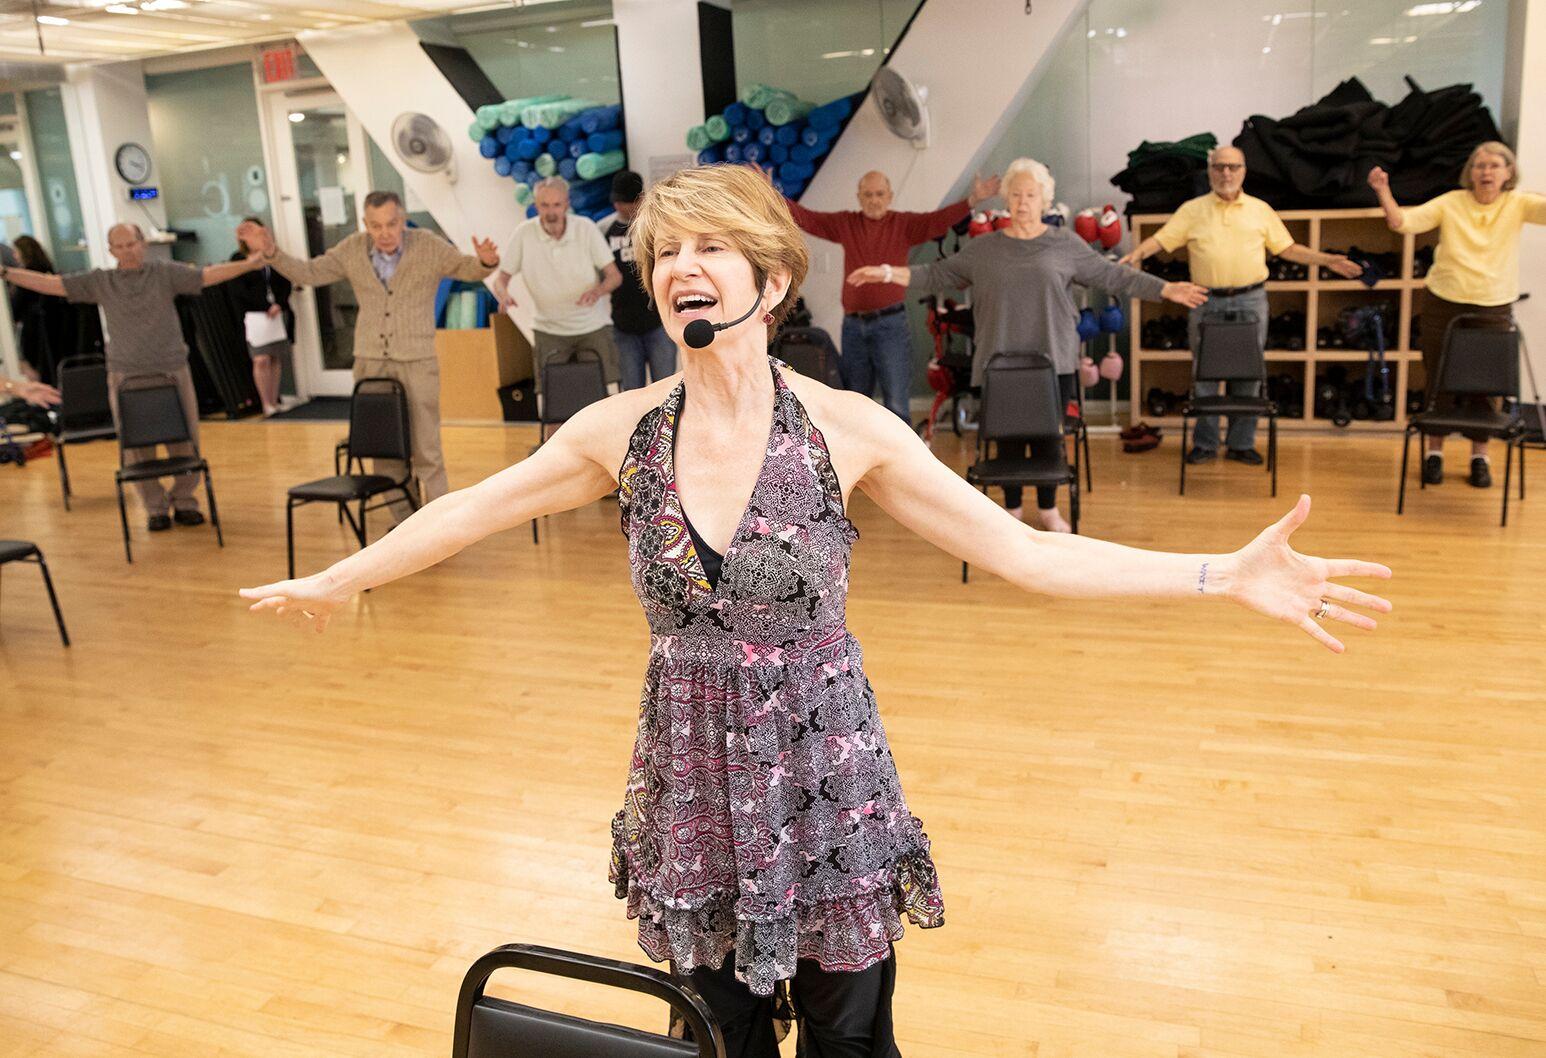 Community members participate in the Edmond J. Safra Parkinson's Wellness Program at the Marlene Meyerson JCC in Manhattan.